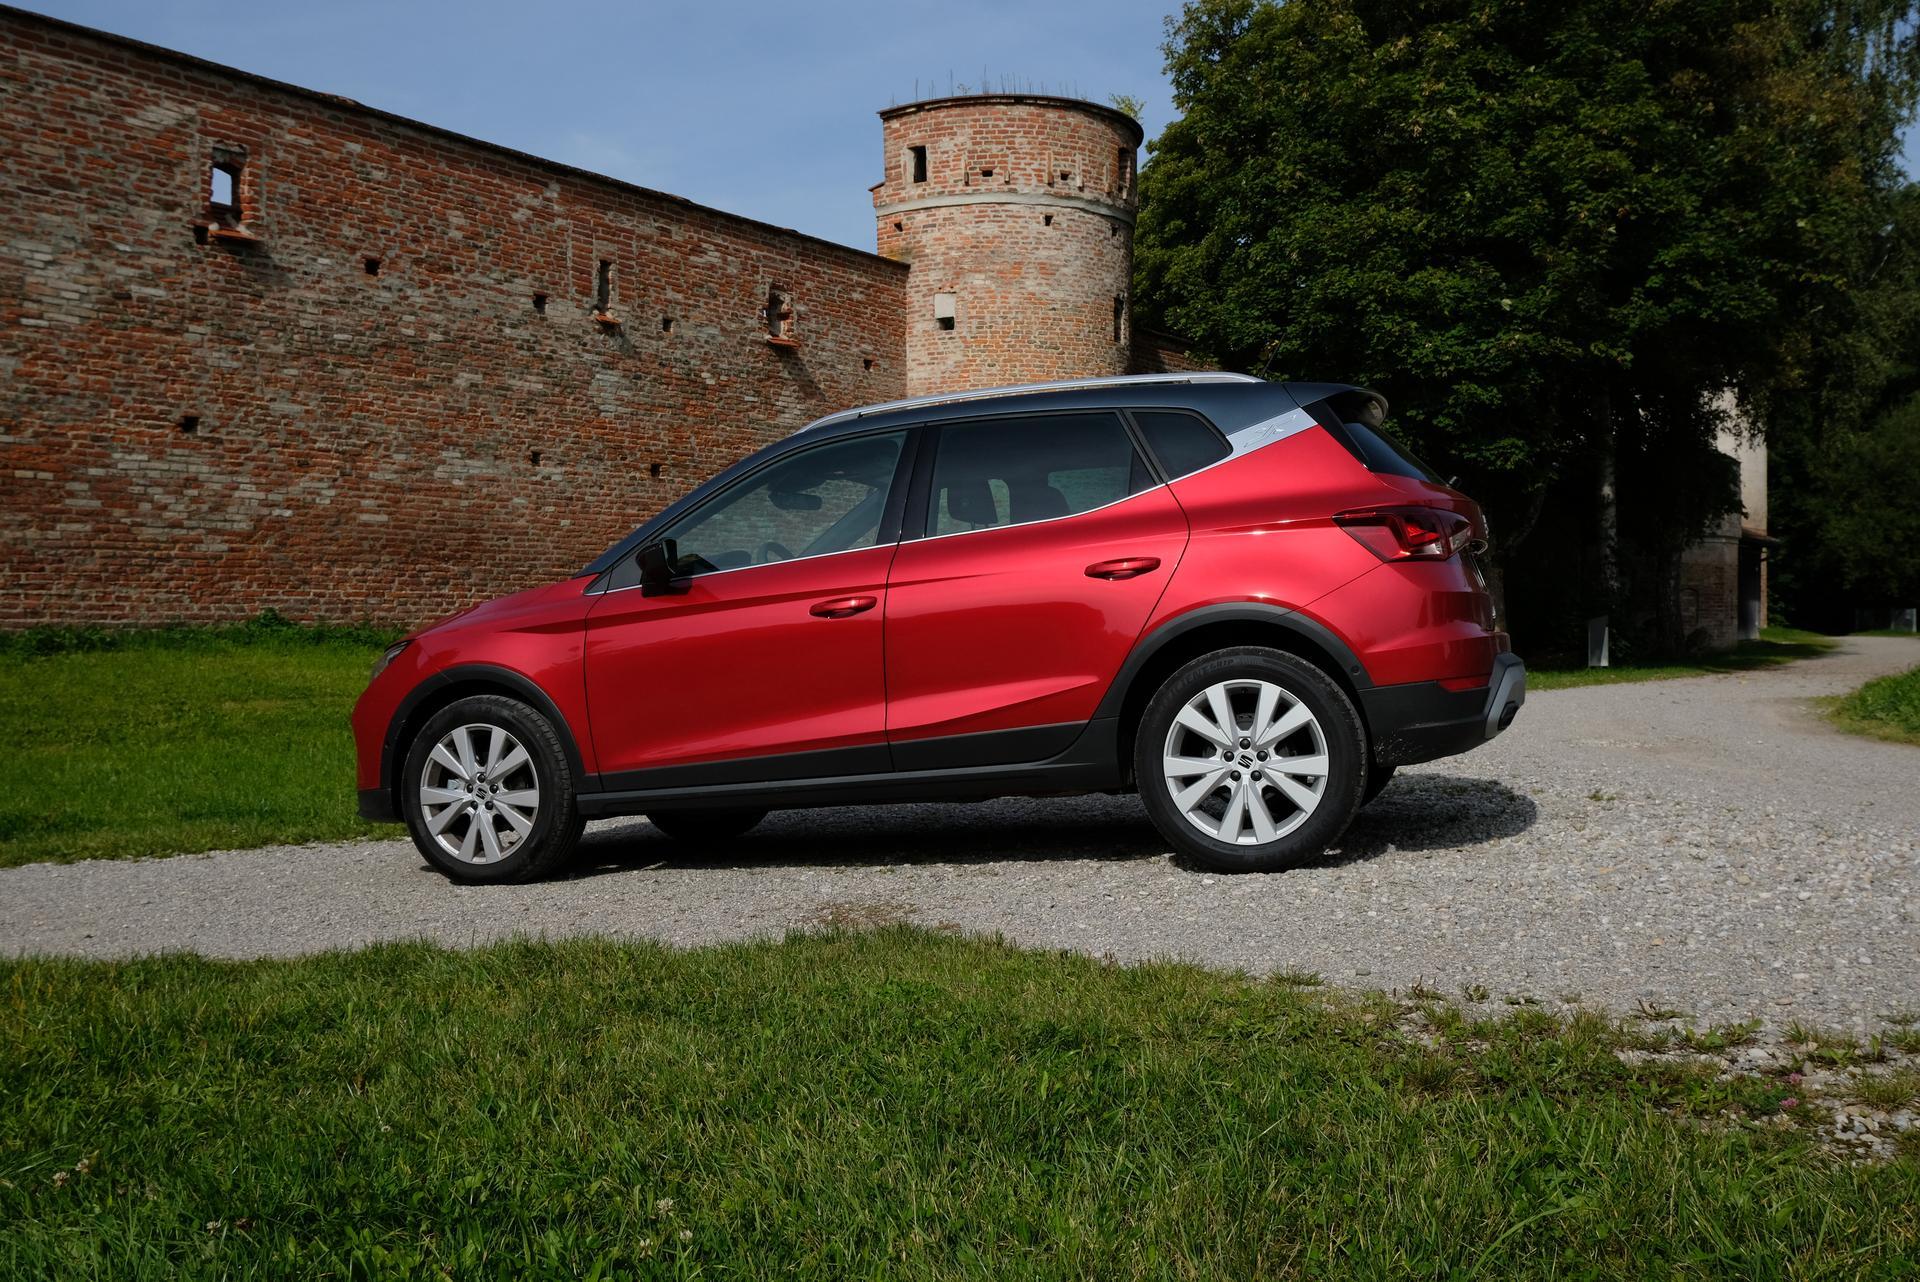 Facelift: SEAT Arona 1.0 TGI Fahrerseite